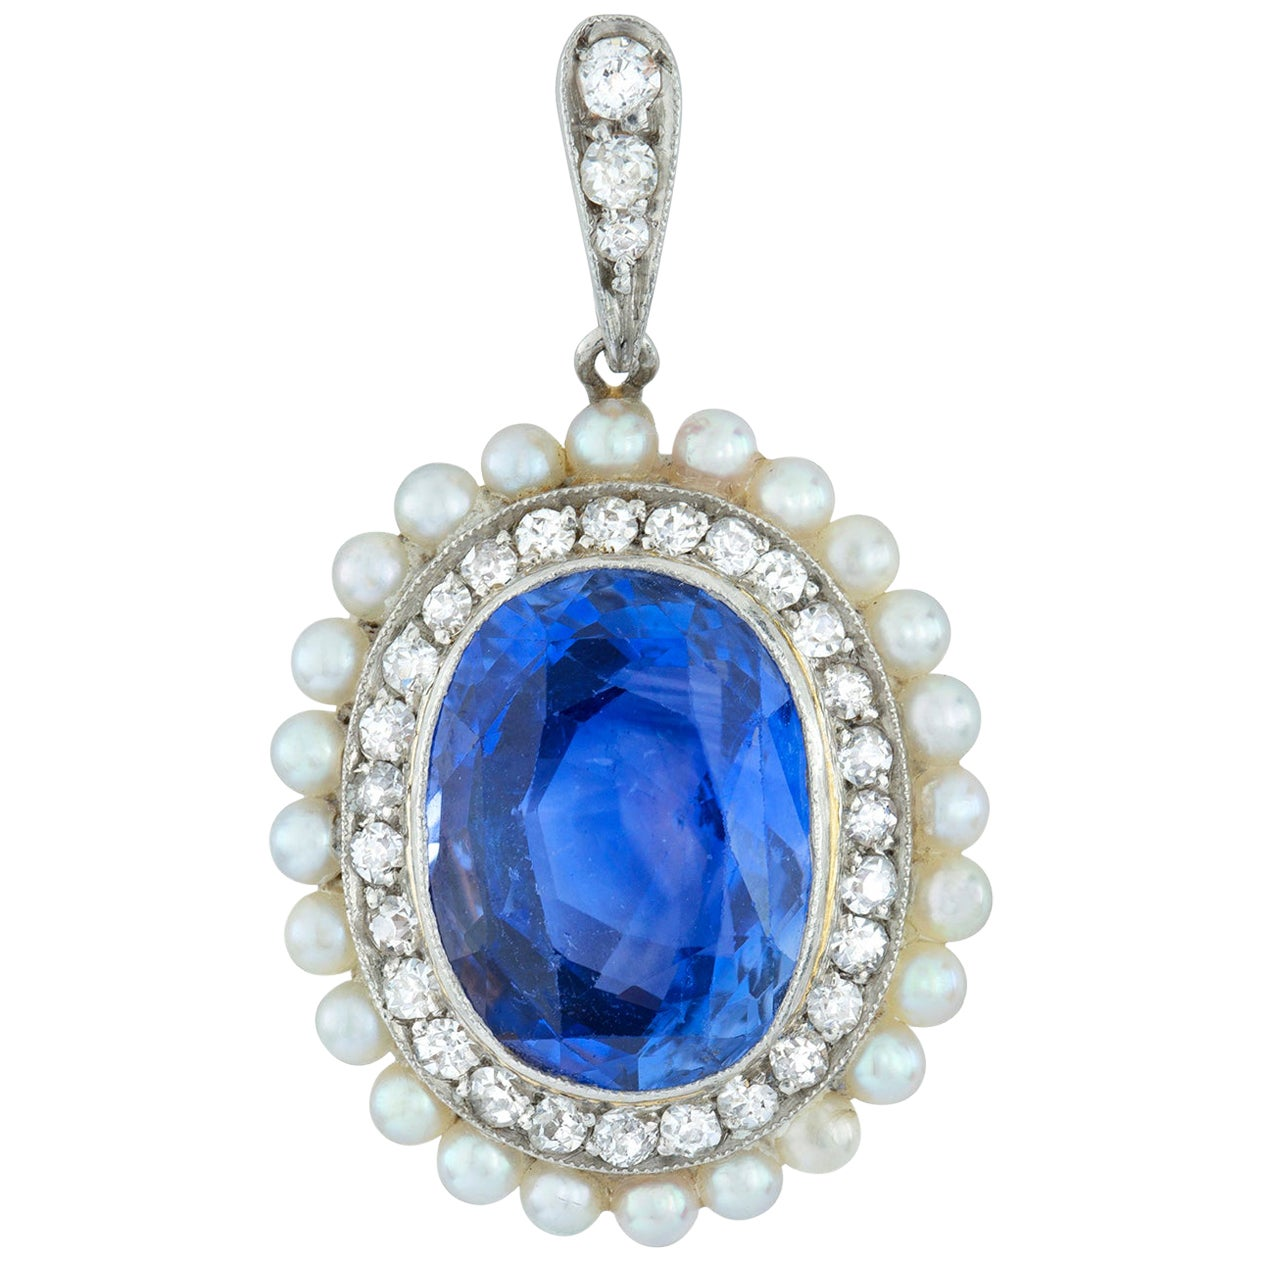 Edwardian Sapphire Diamond and Pearl Pendant